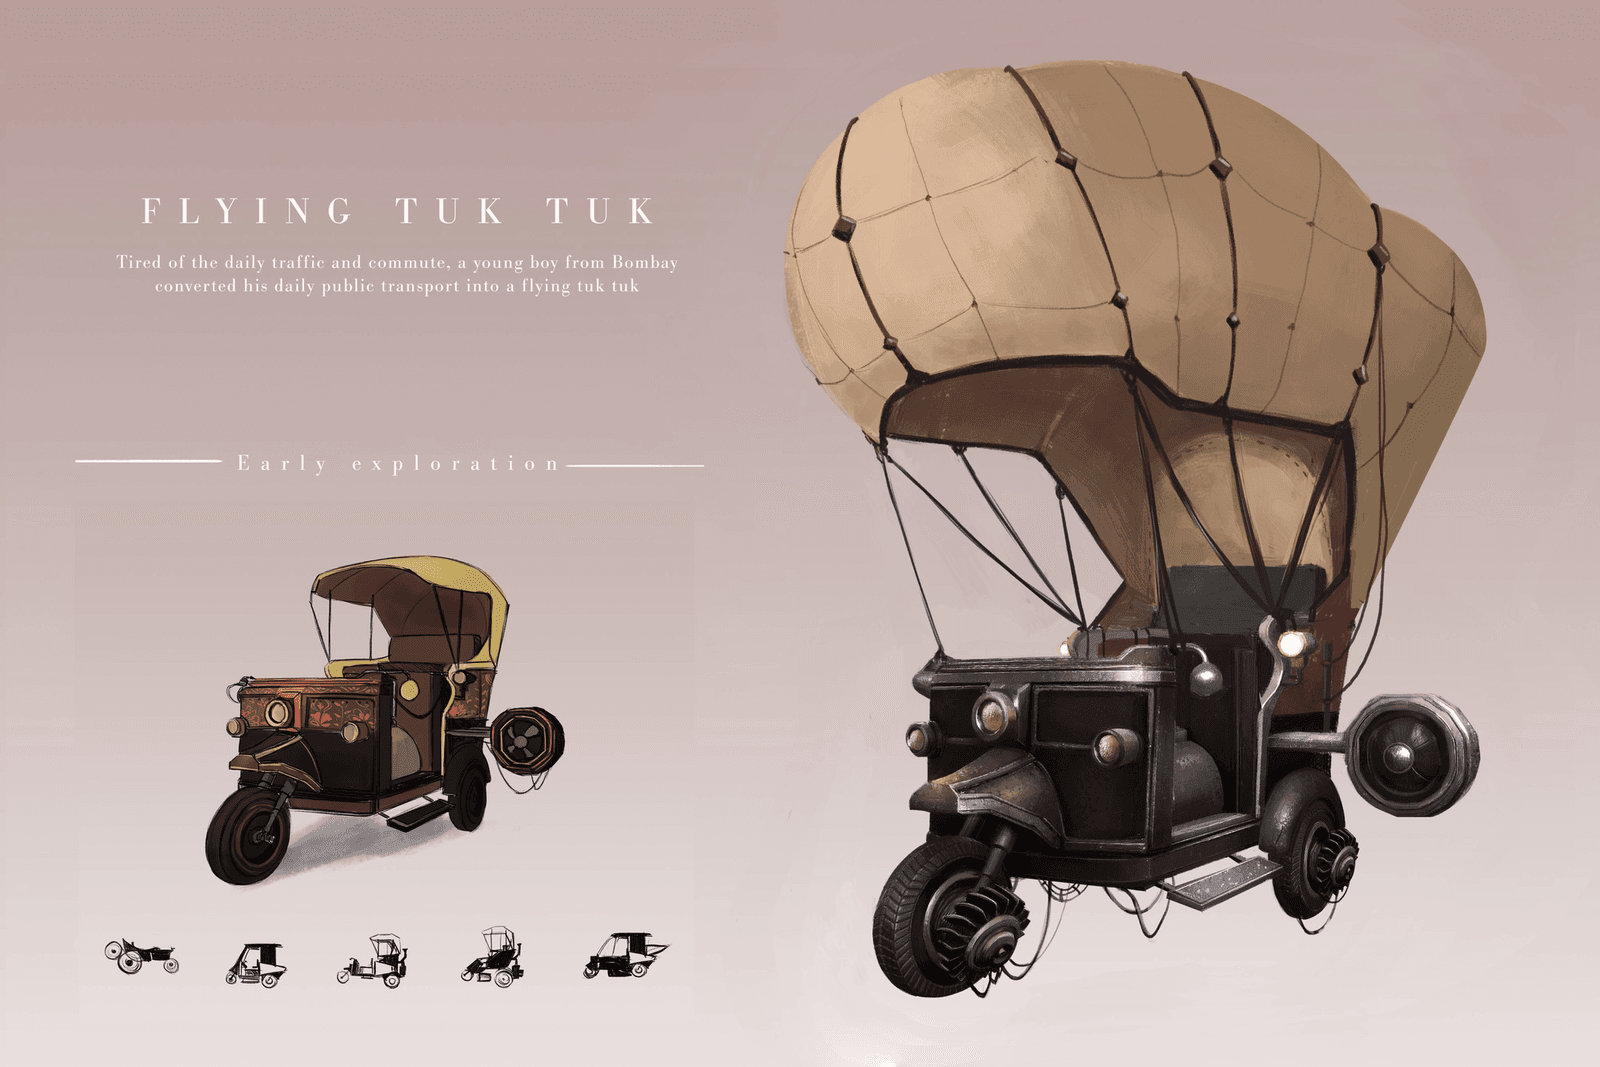 Flying Tuk Tuk